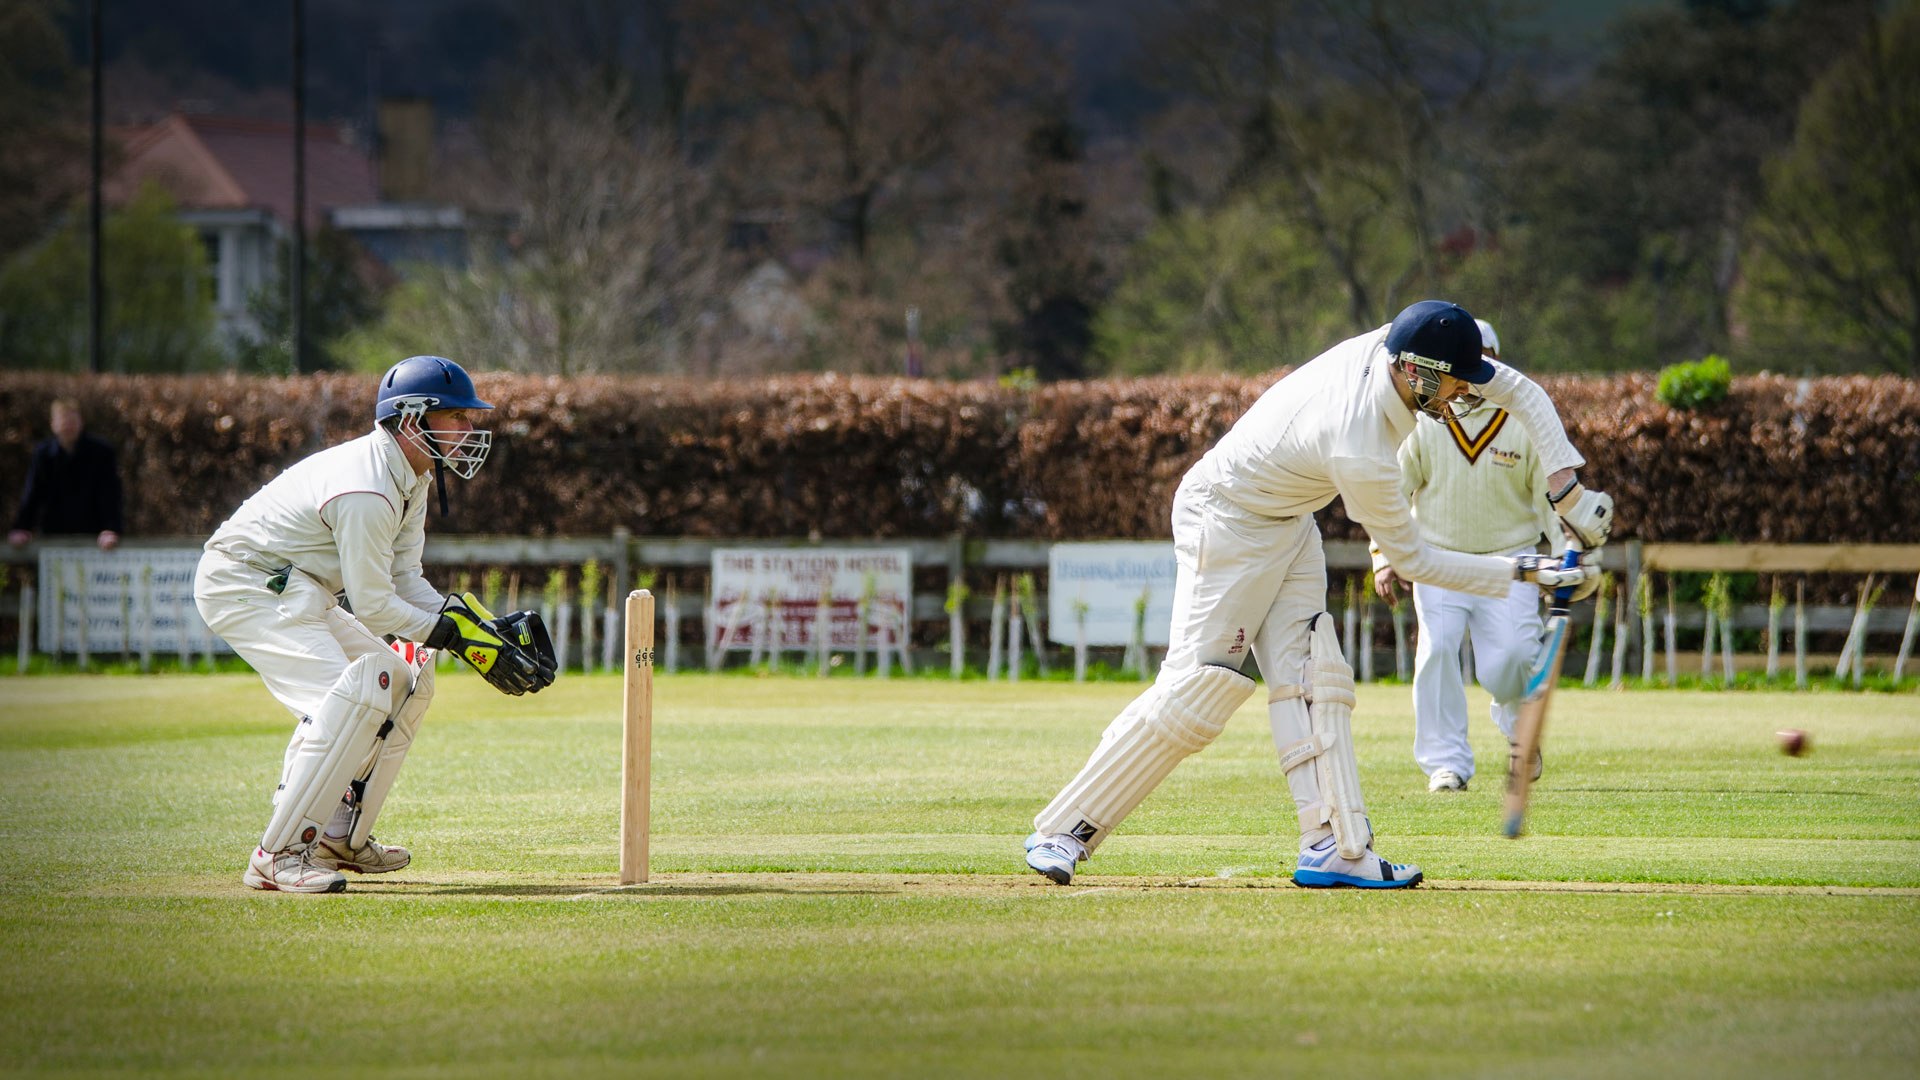 rory-kroon-defensive-shot-ilkley-cricket-club.jpg